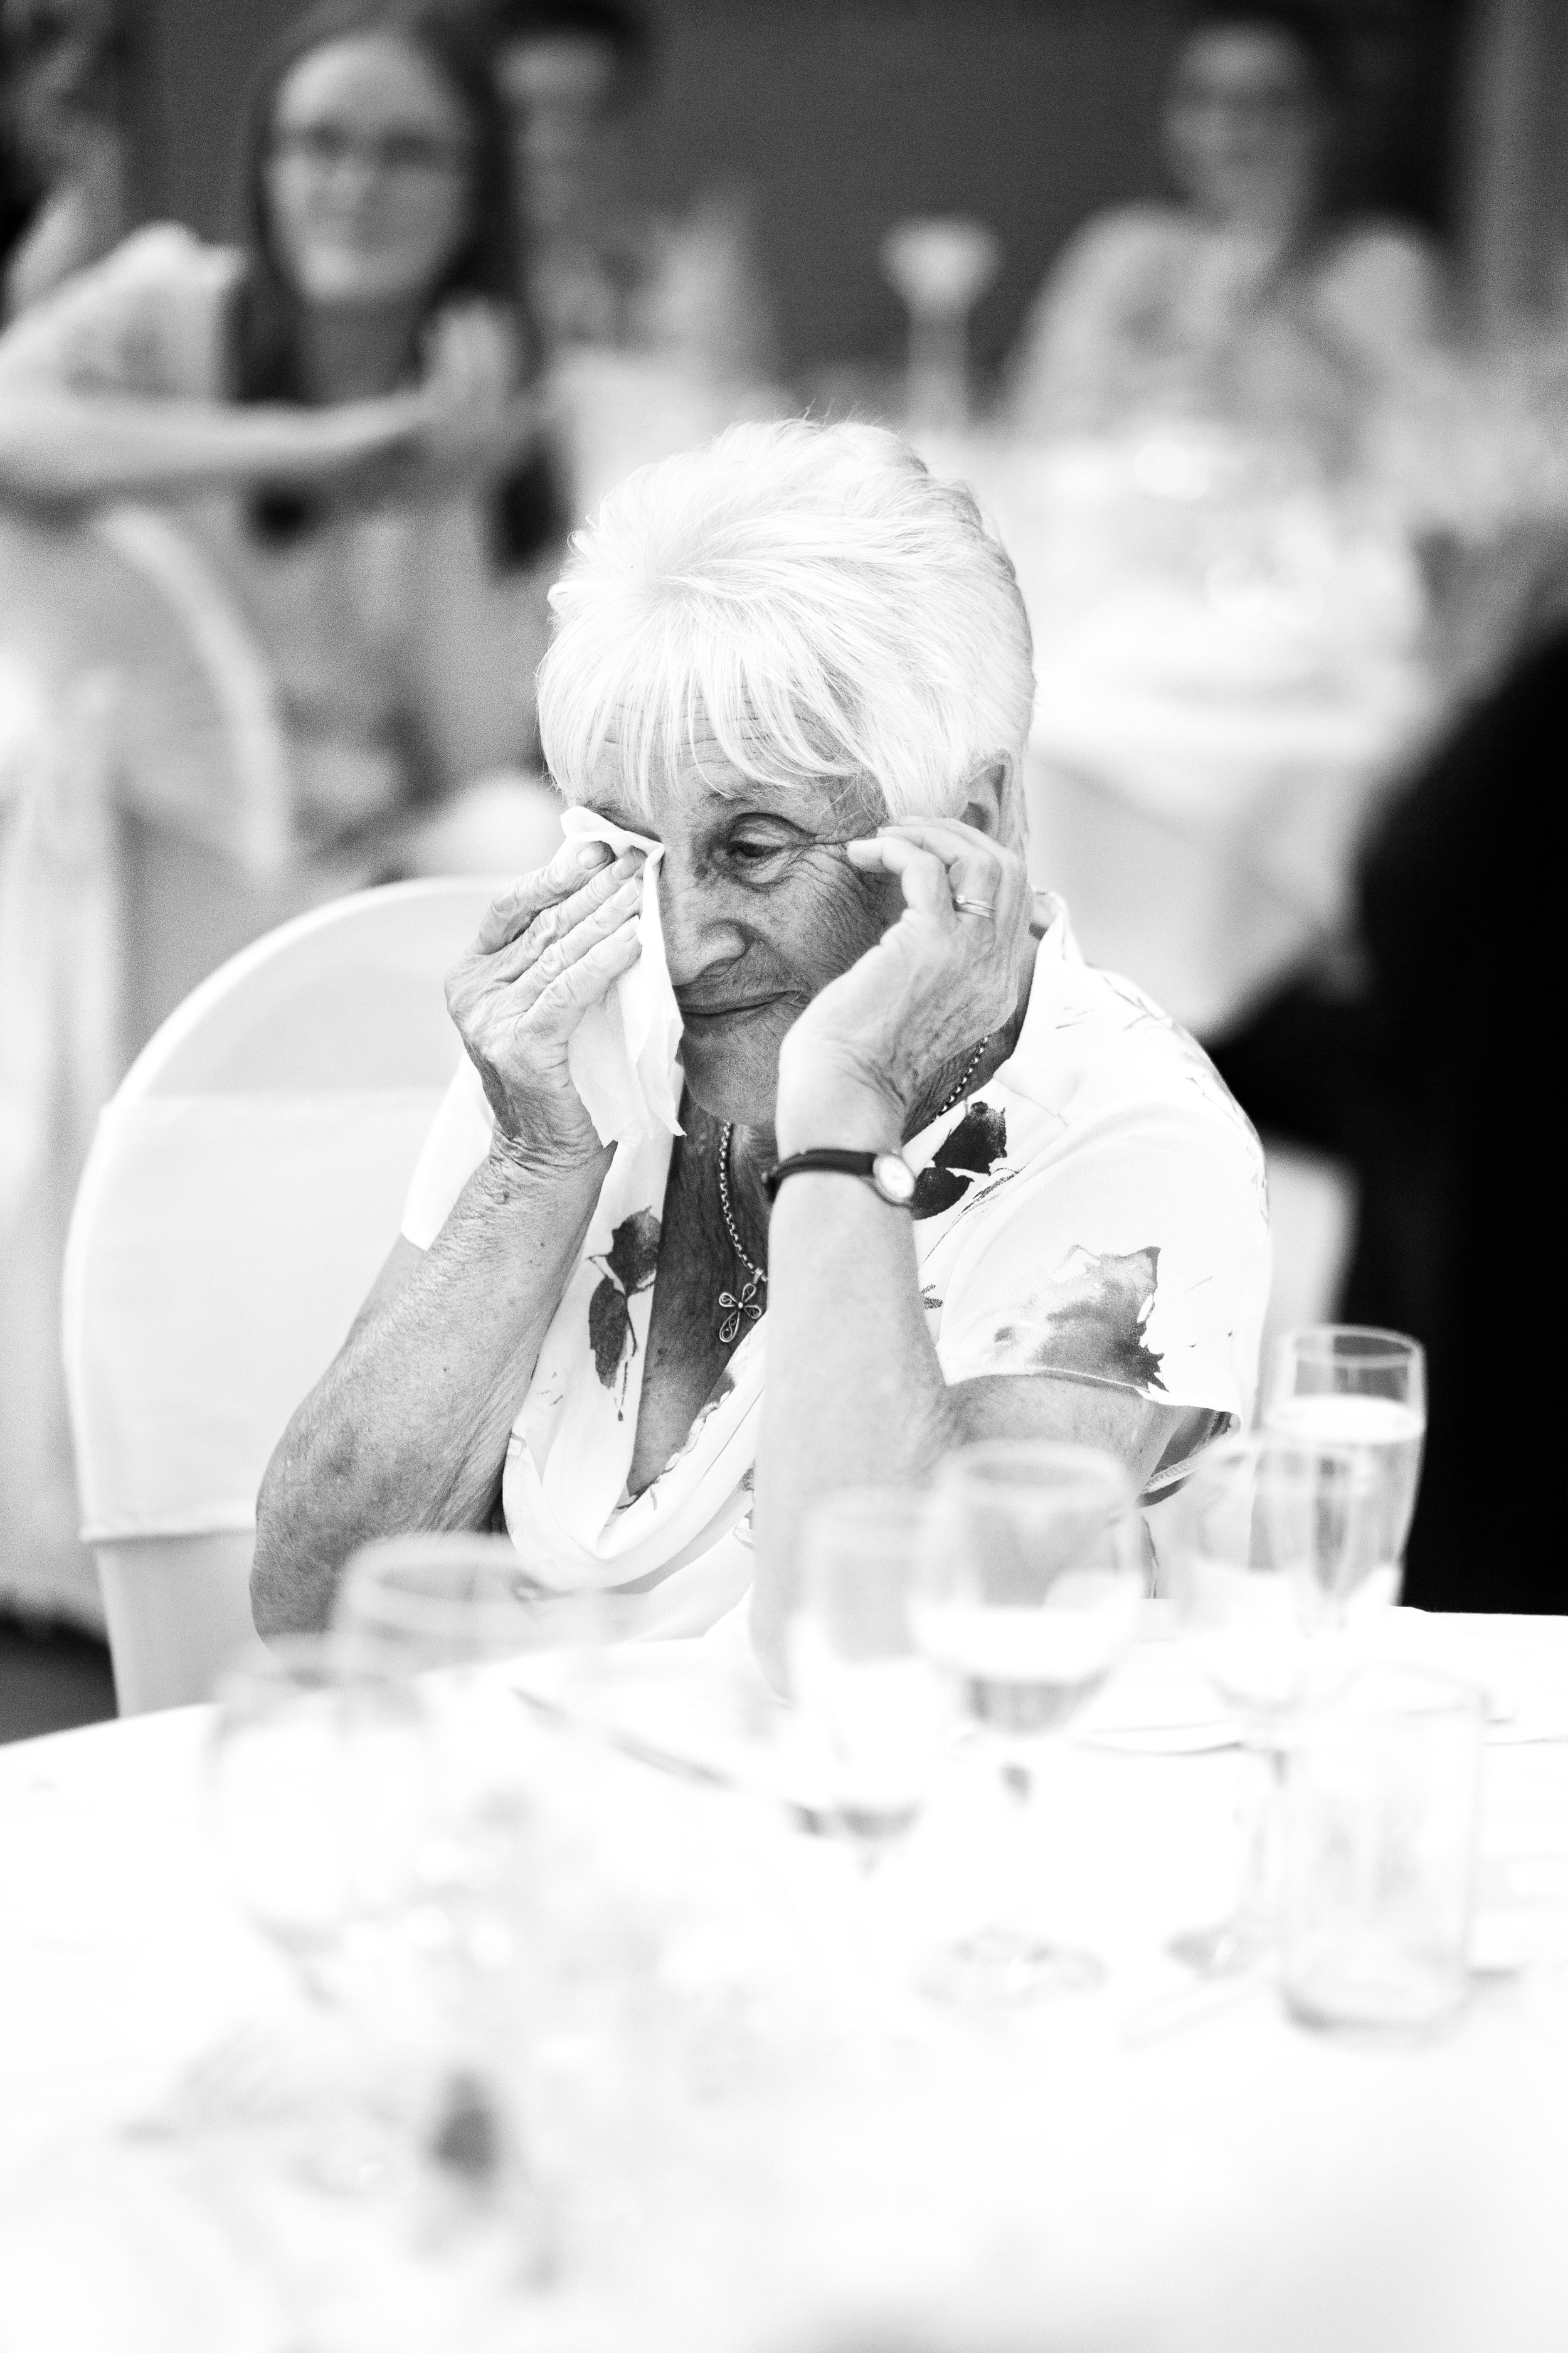 wedding-lea-cooper-photography-willenhall-west-midlands-wolverhampton-dudley-birmingham-uk-marriage-hadley-park-east-telford-sad-tears.jpg